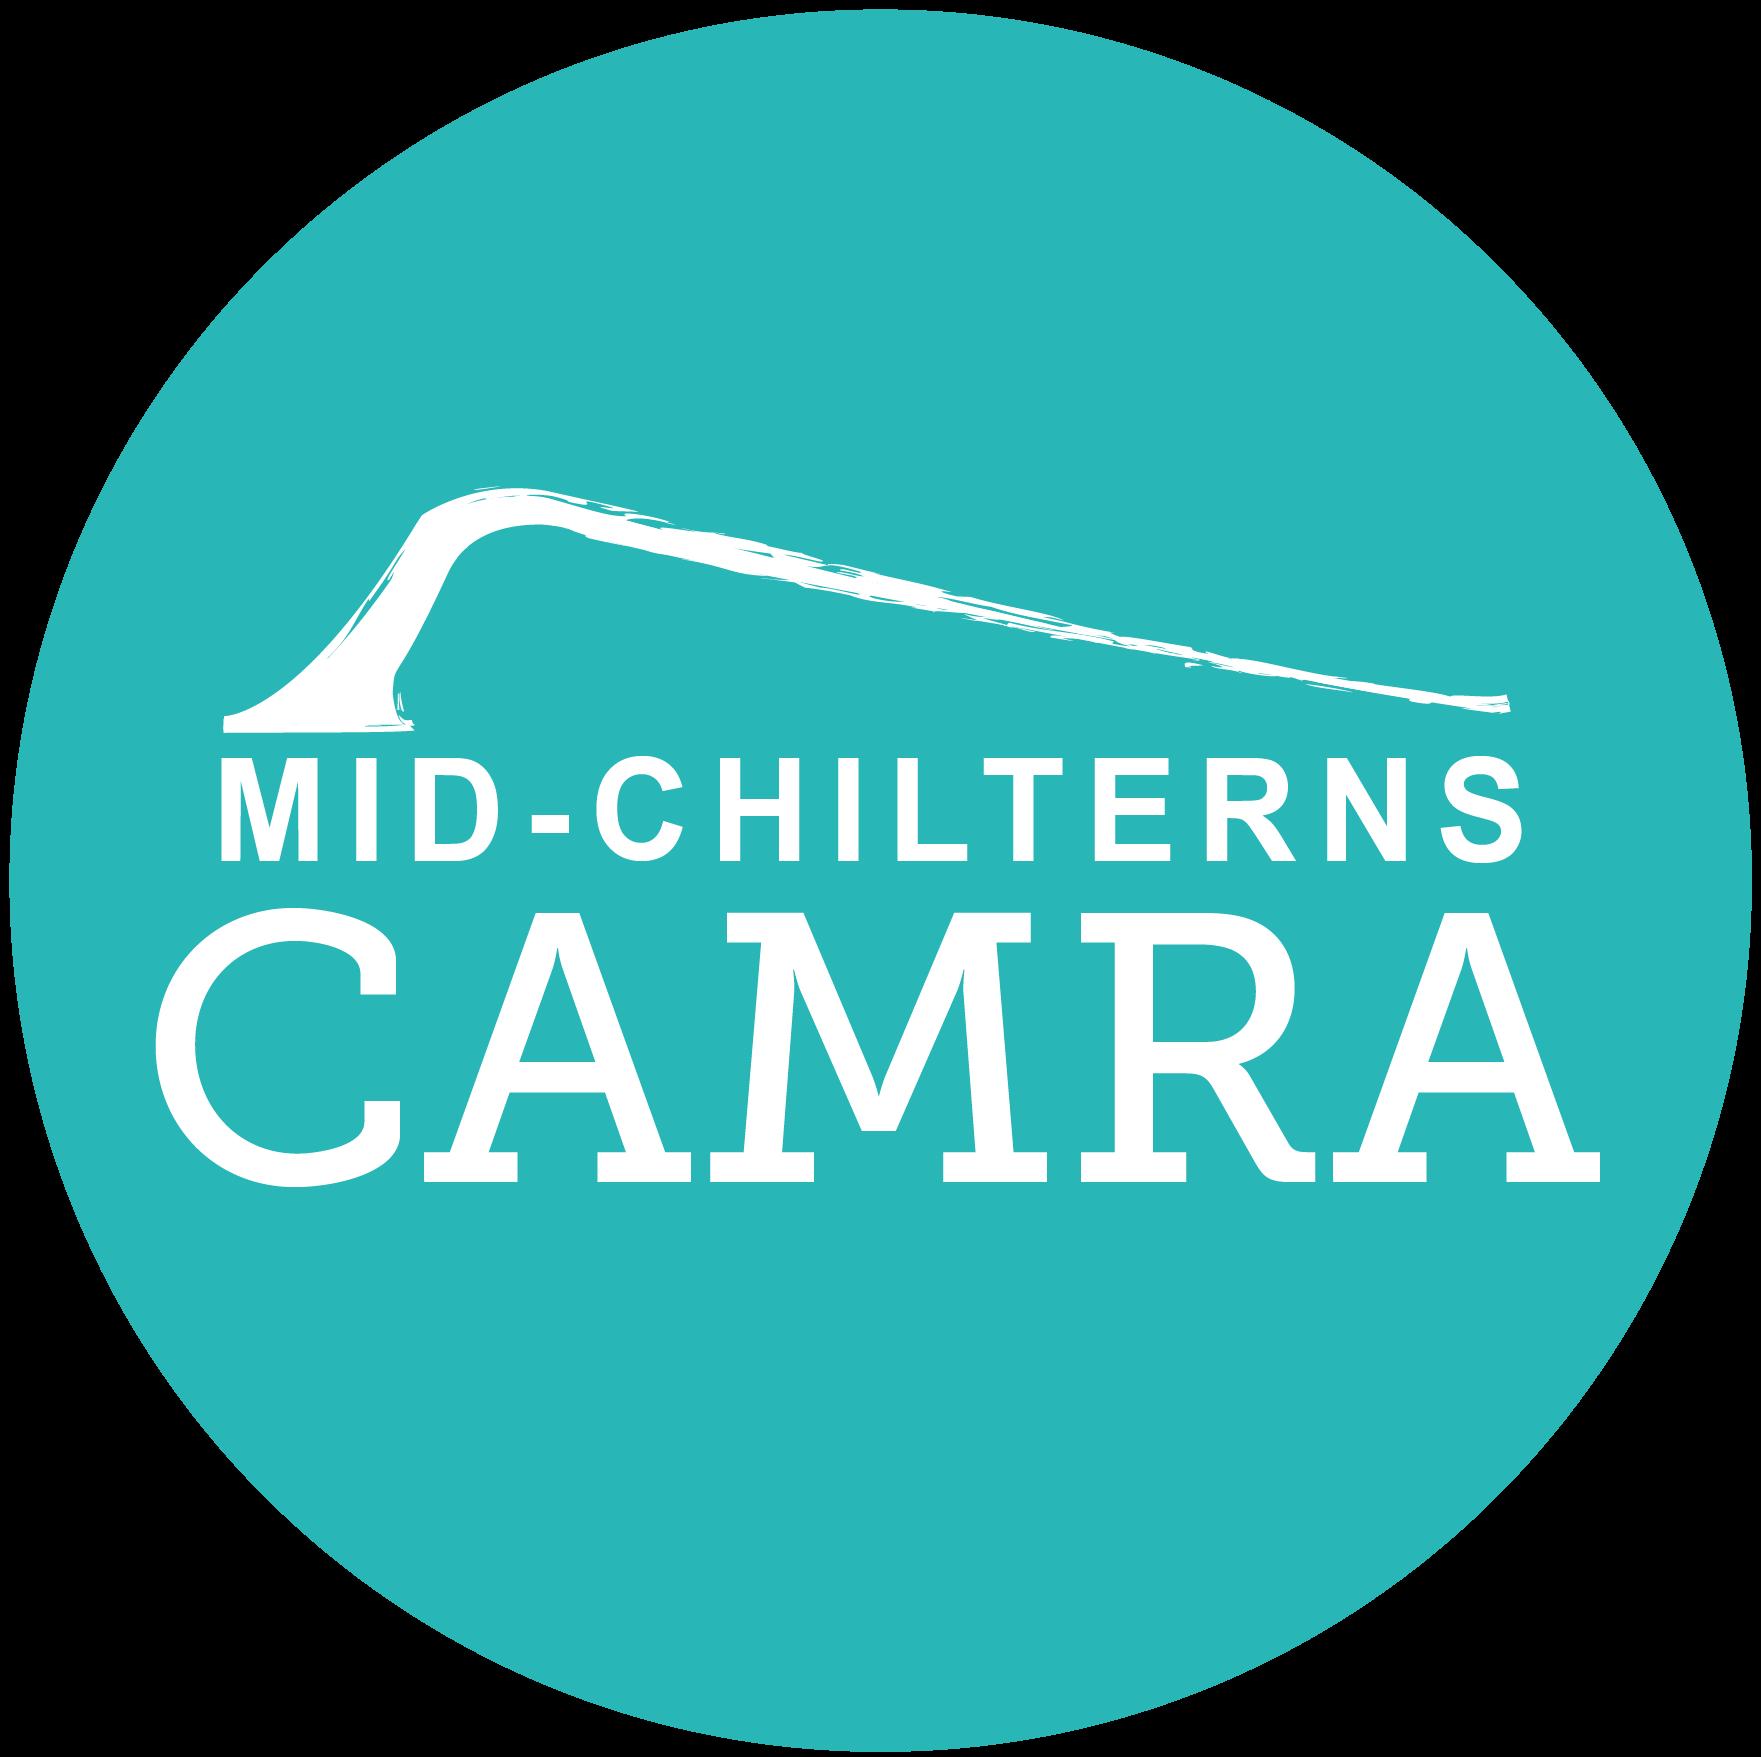 Mid-Chilterns CAMRA